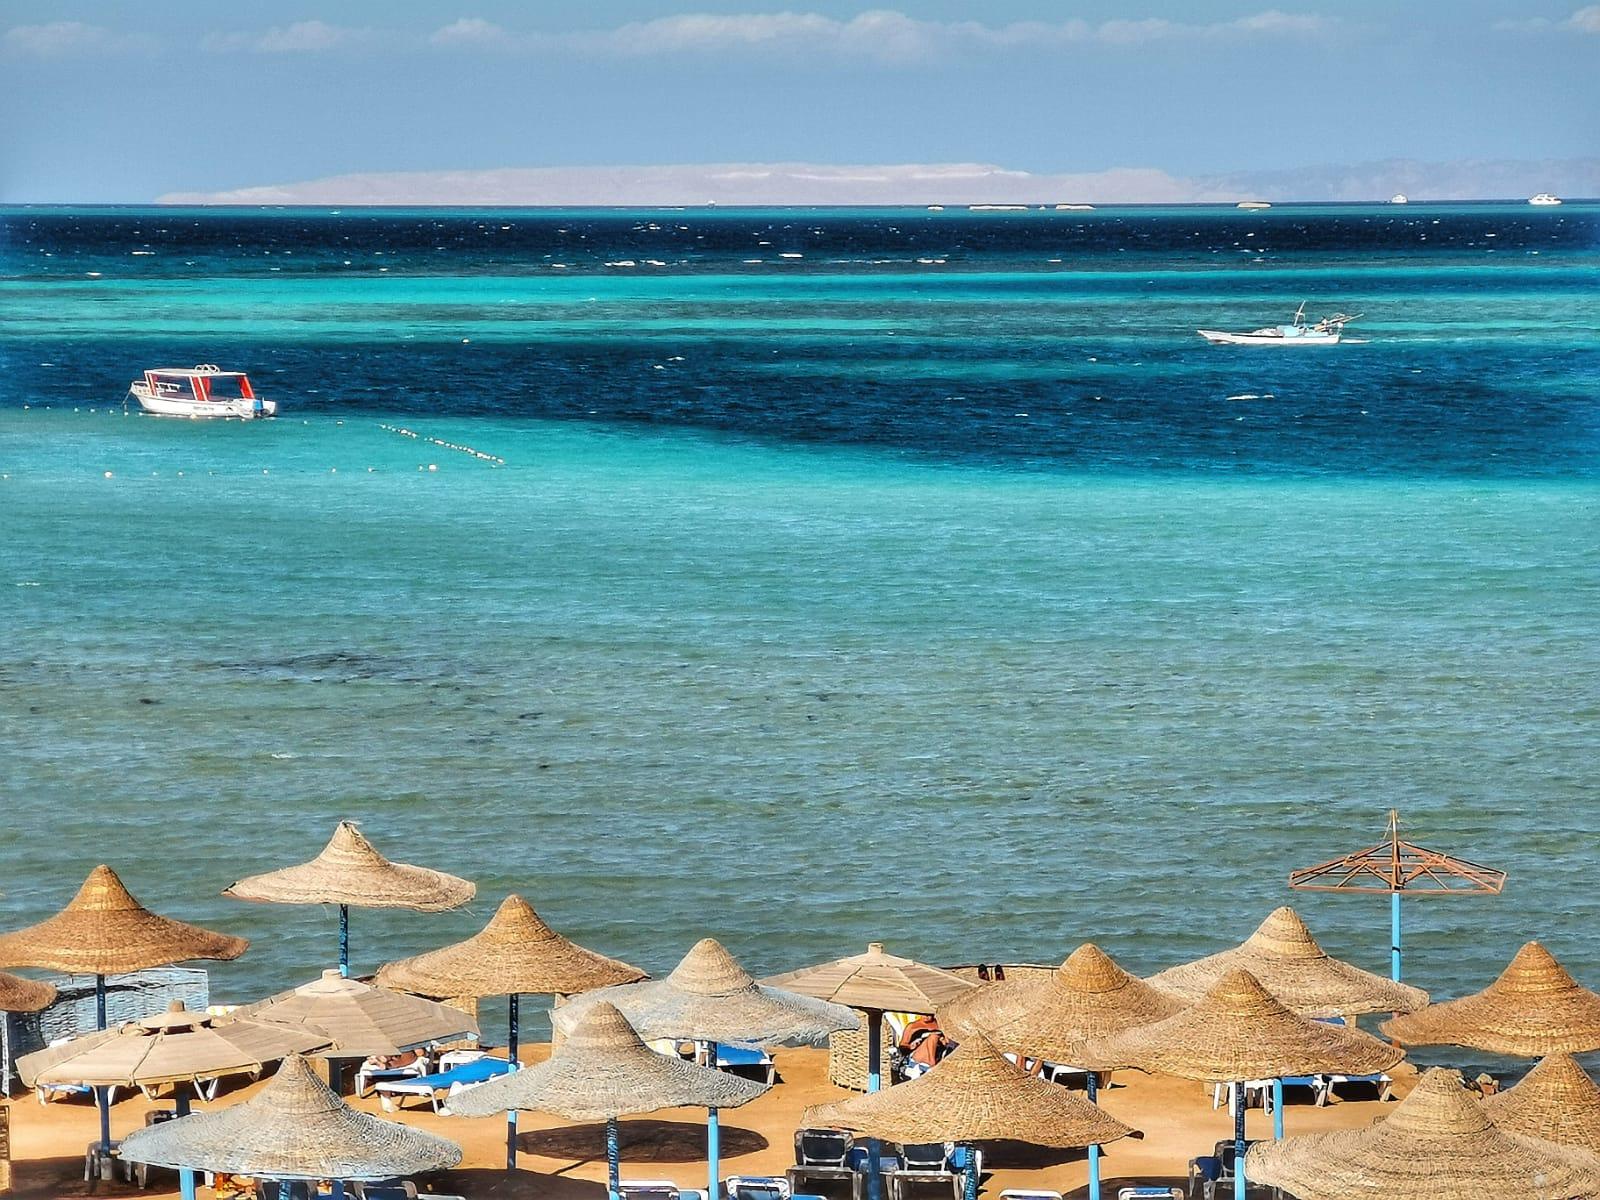 Letovanje_Egipat_Hoteli_Avio_Hurgada_Hotel_Magic_Beach-1.jpeg